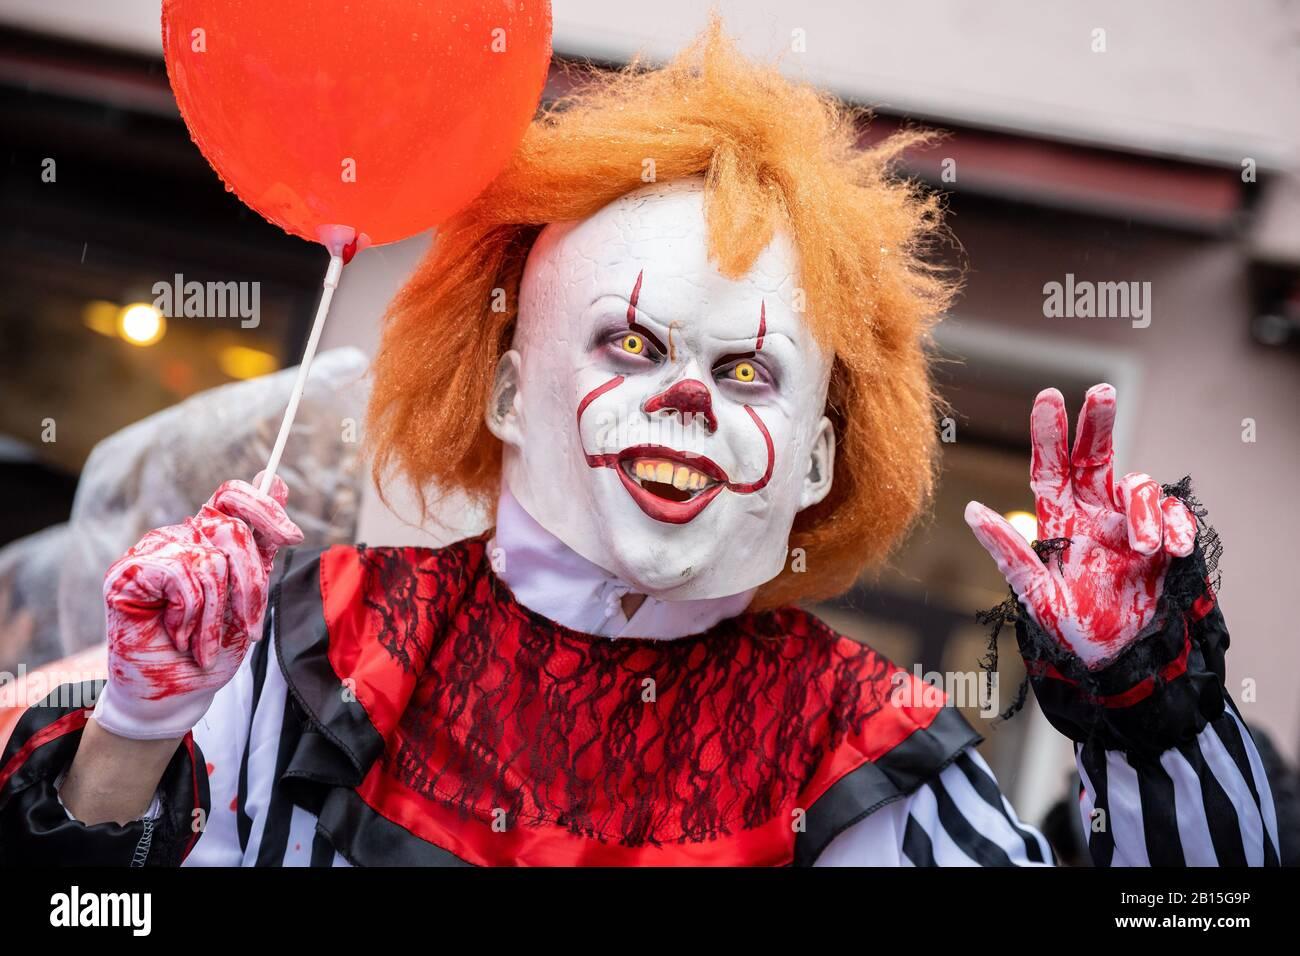 Brunswick Halloween 2020 Brunswick, Germany. 23rd Feb, 2020. A carnivalist dressed as a